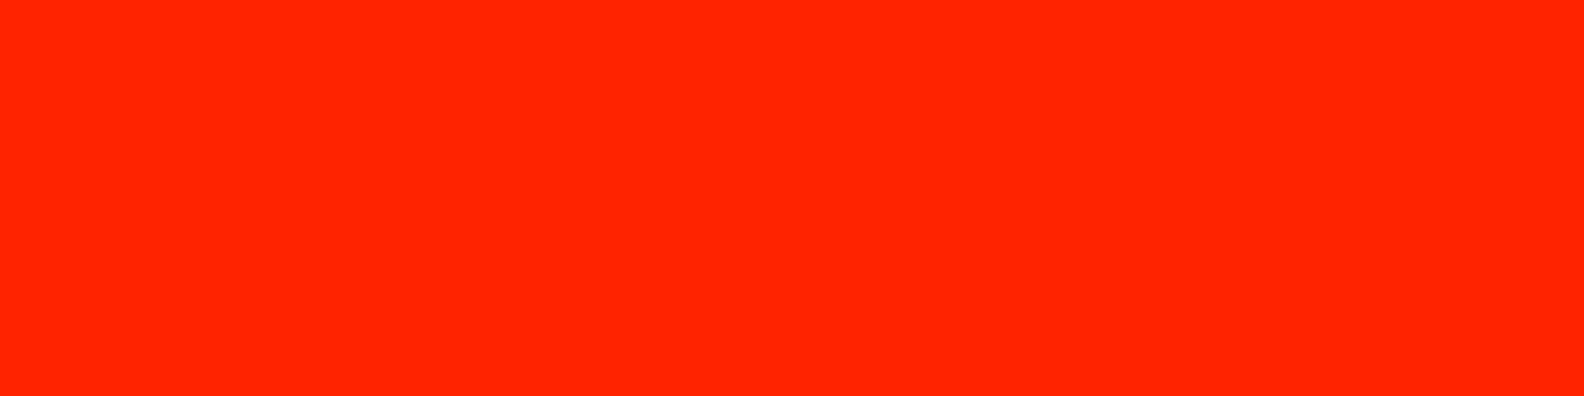 1584x396 Scarlet Solid Color Background